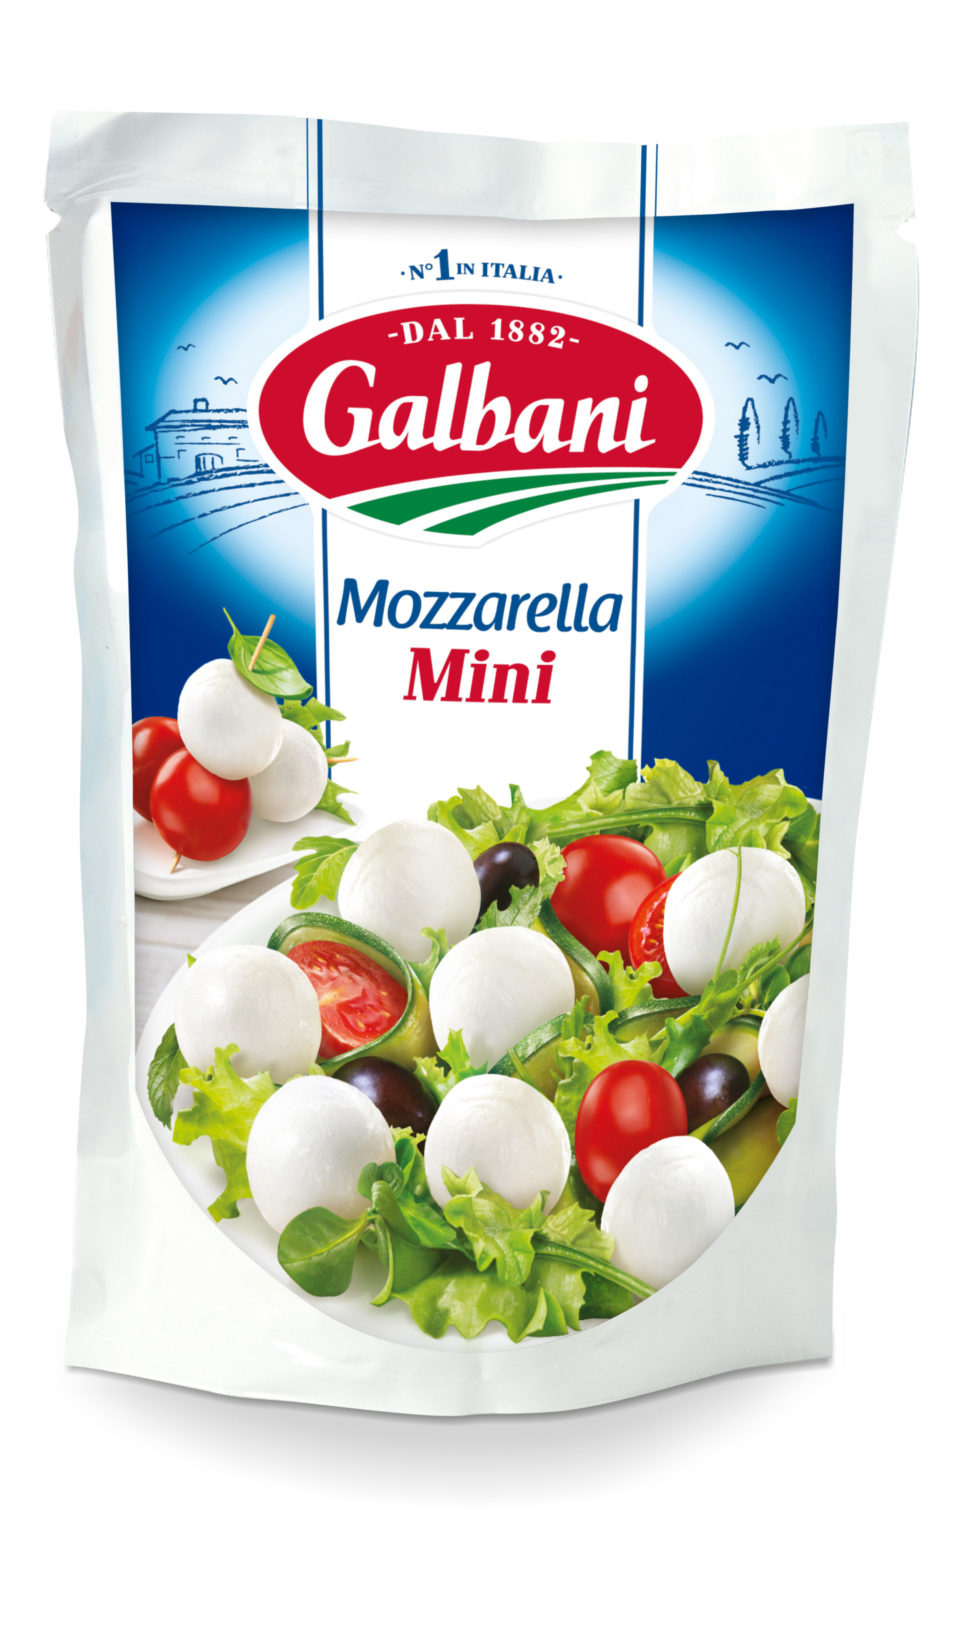 EW DESIGN 2018_032_3D Mozzarella Mini 150g NEW PACK